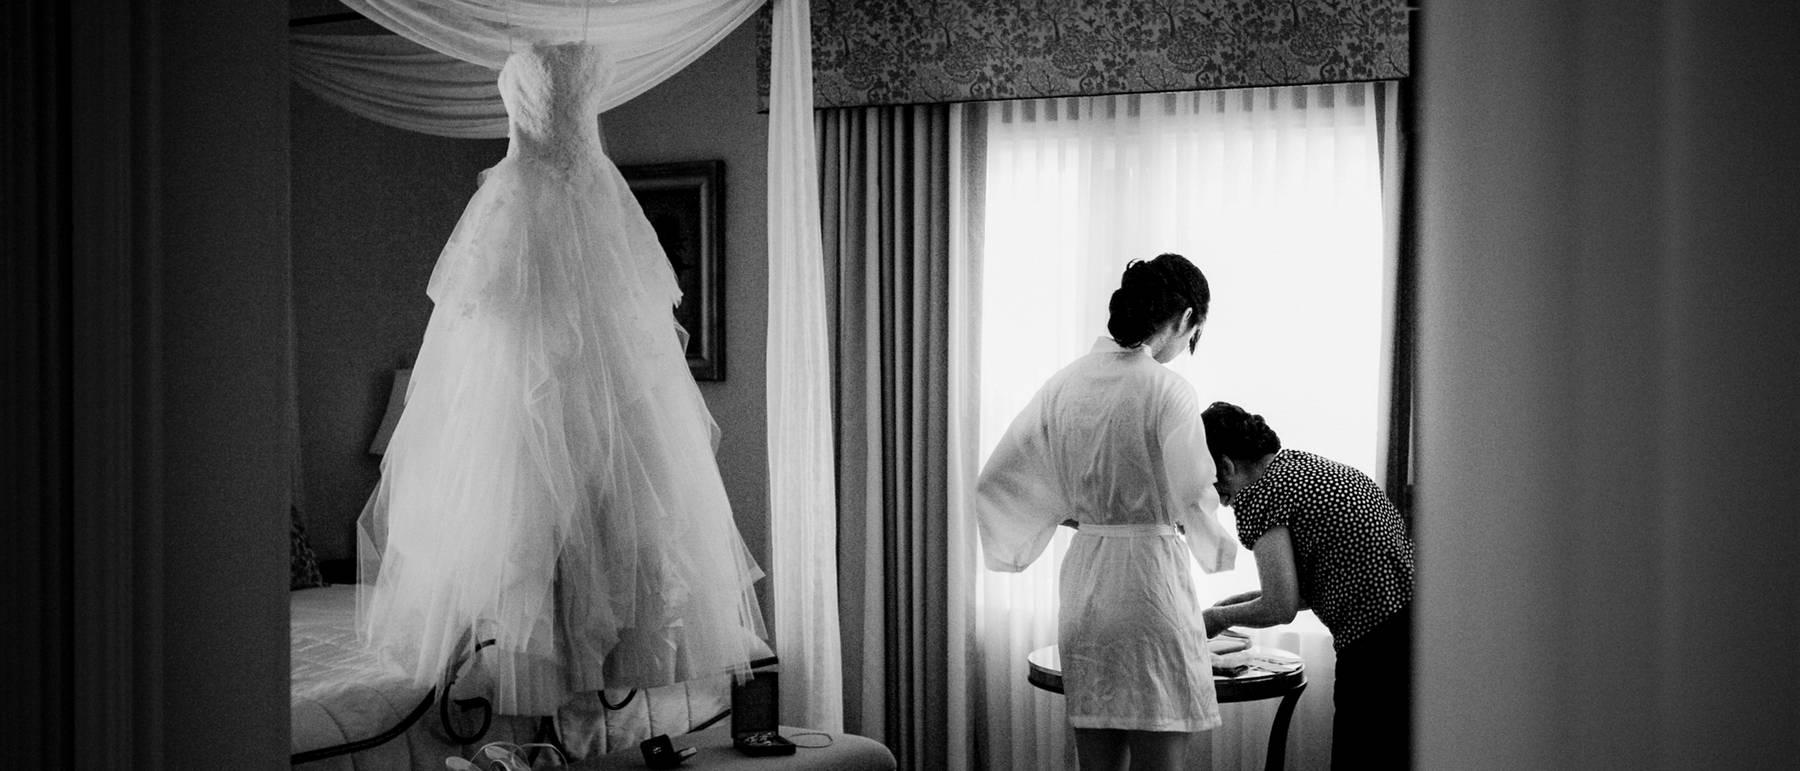 johnandjoseph-wedding-photographer-hz-slider-341